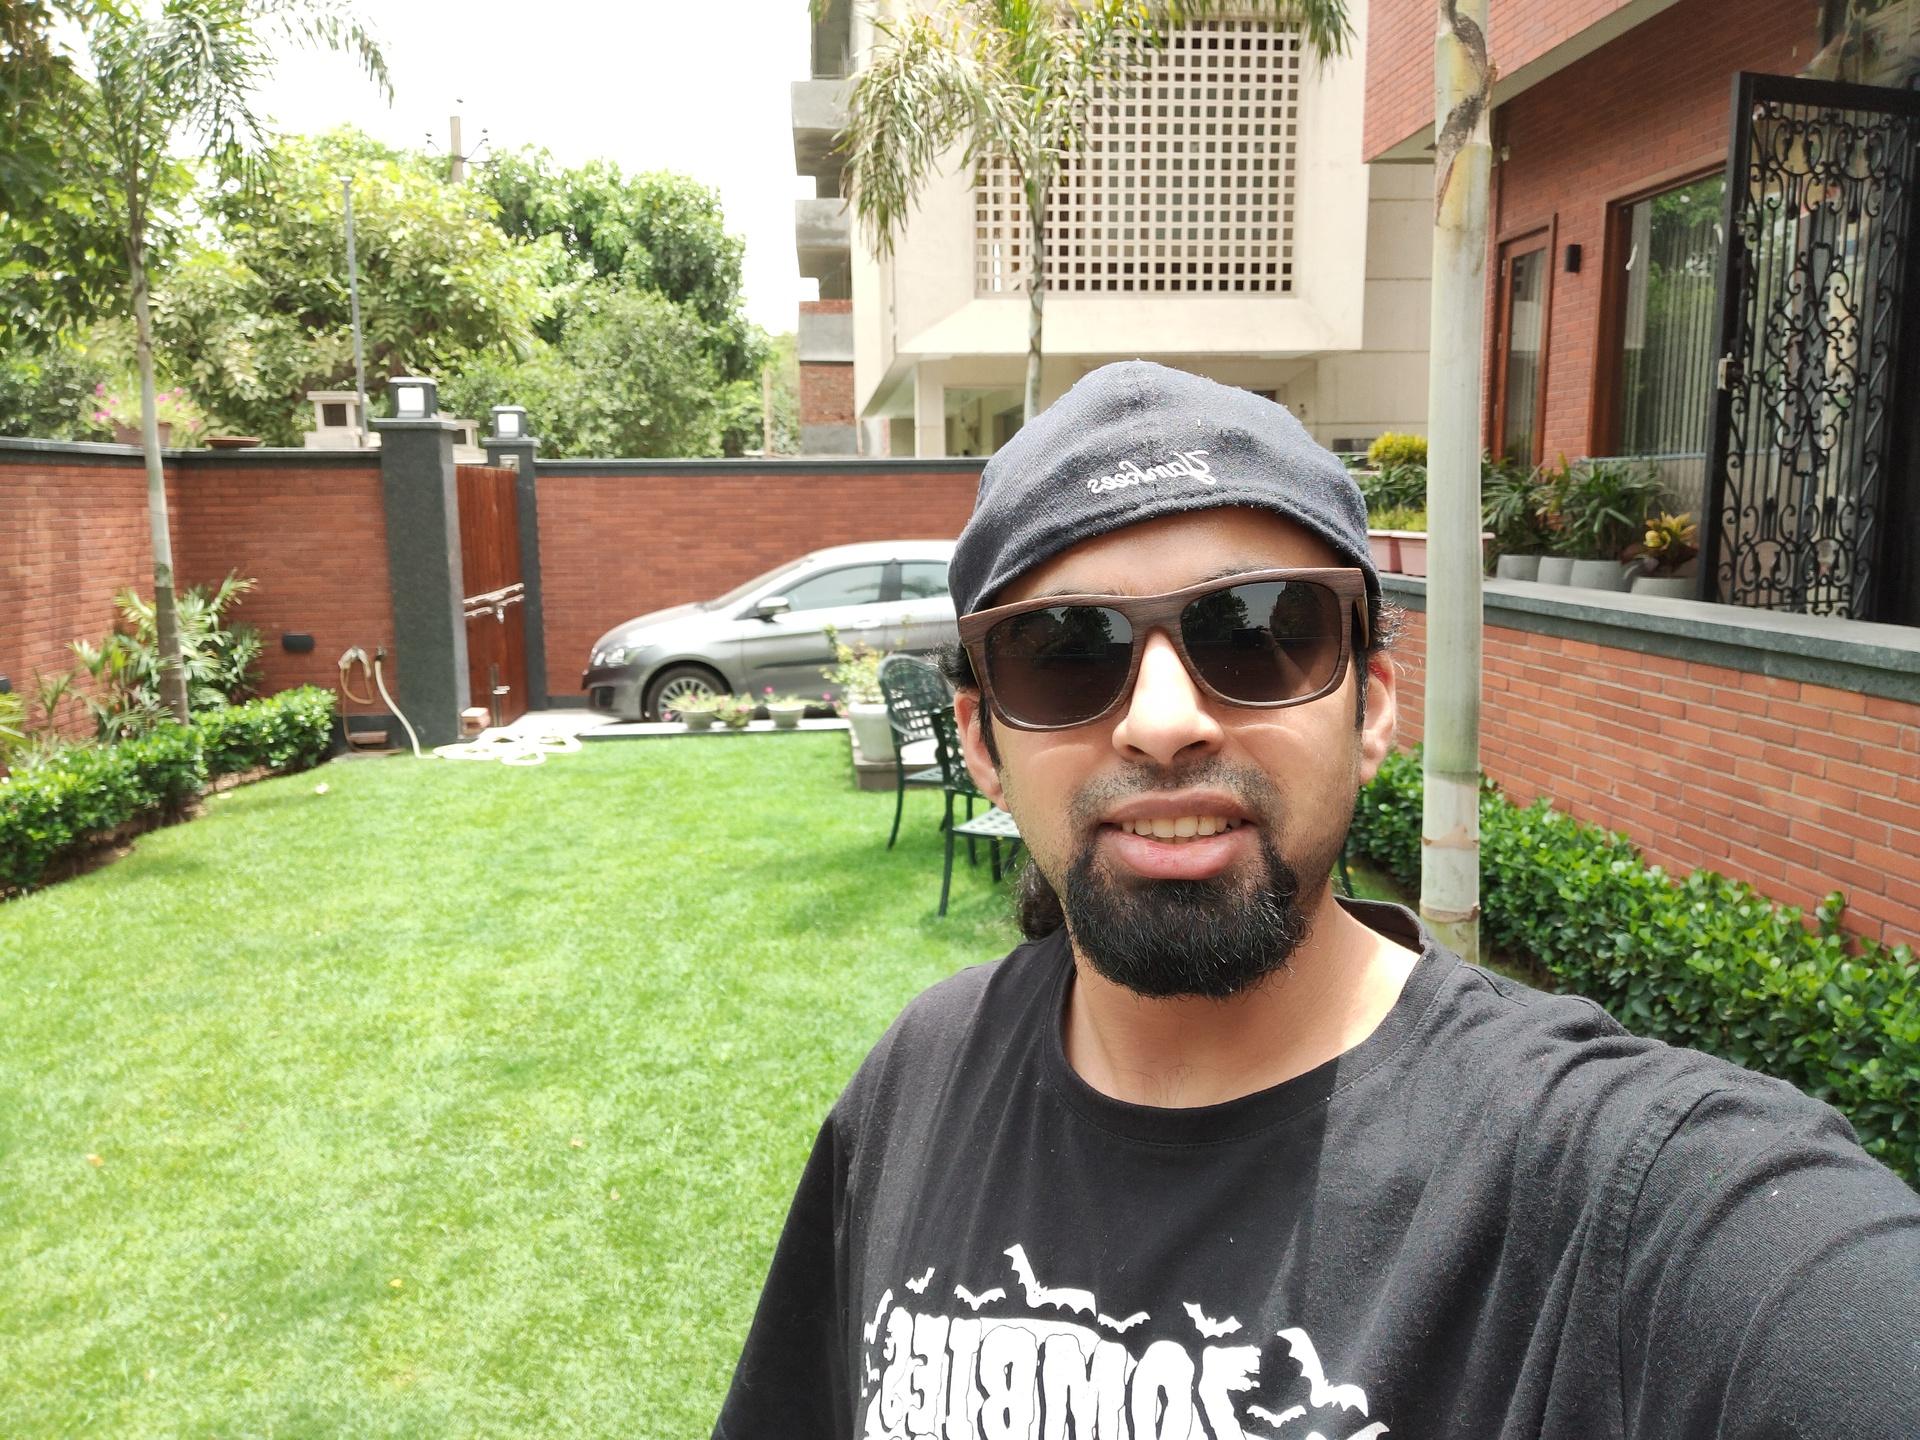 Realme X - Selfie Camera